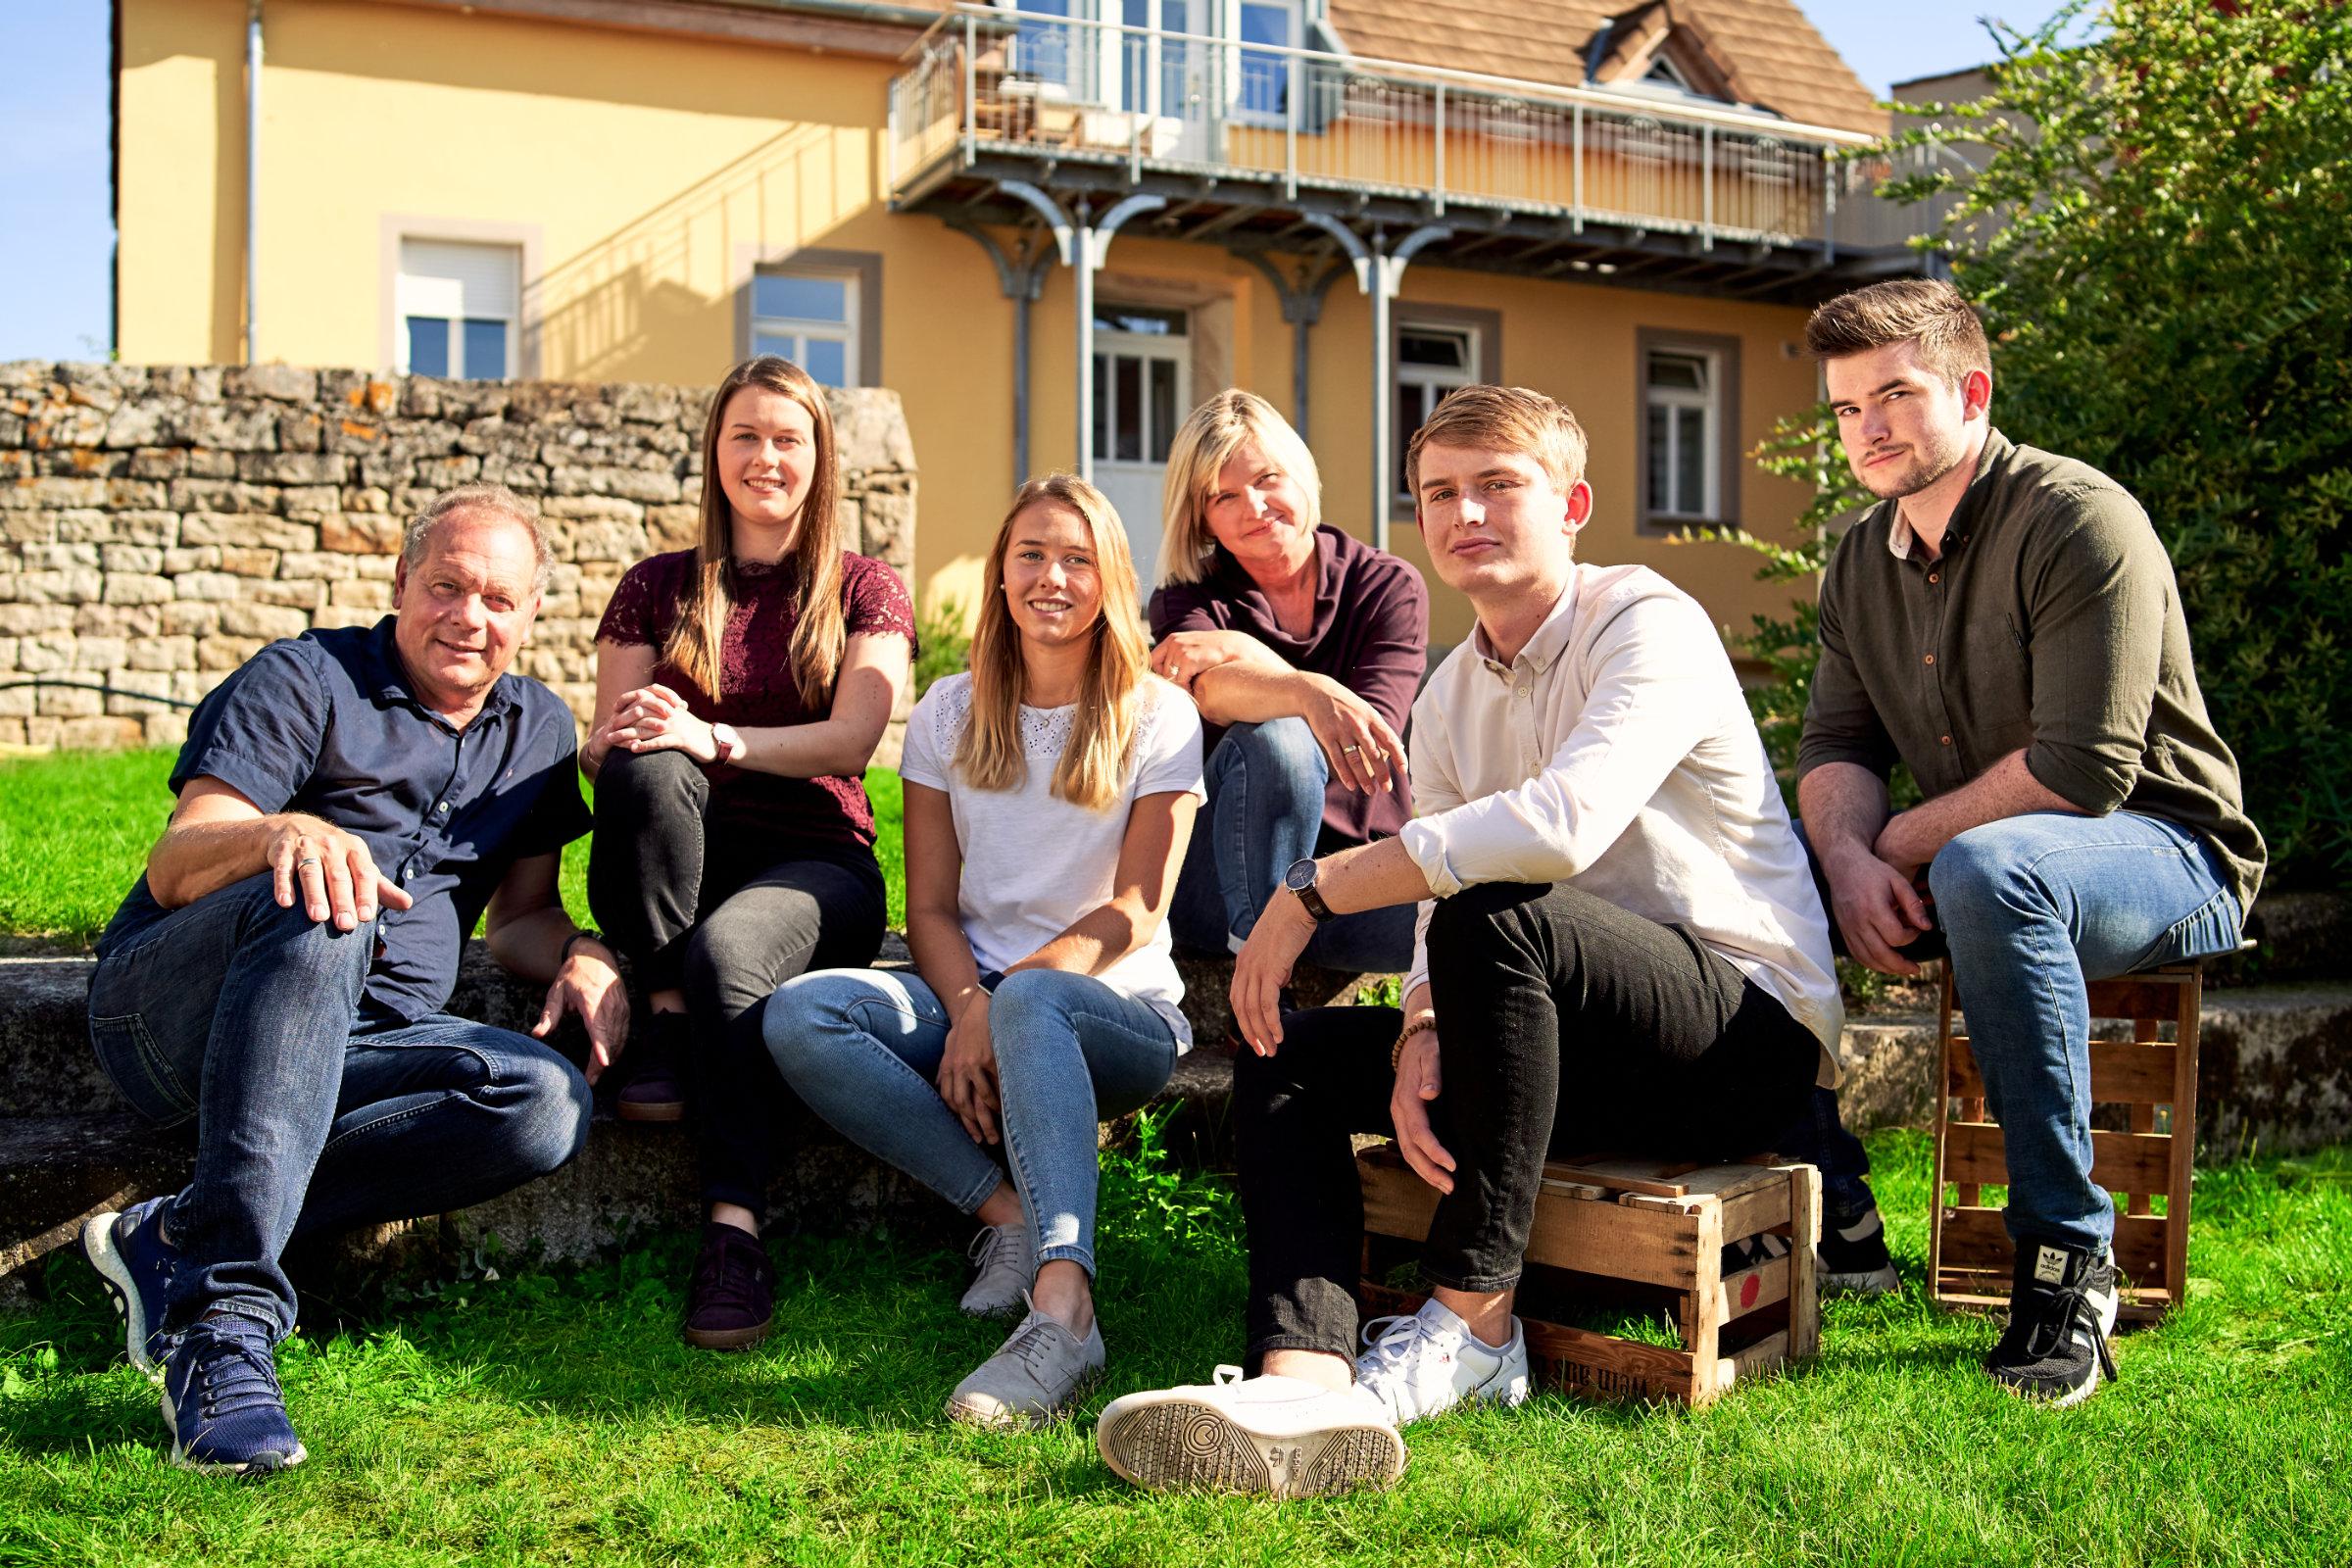 Familie Schoenfeld vom Chumbderhof